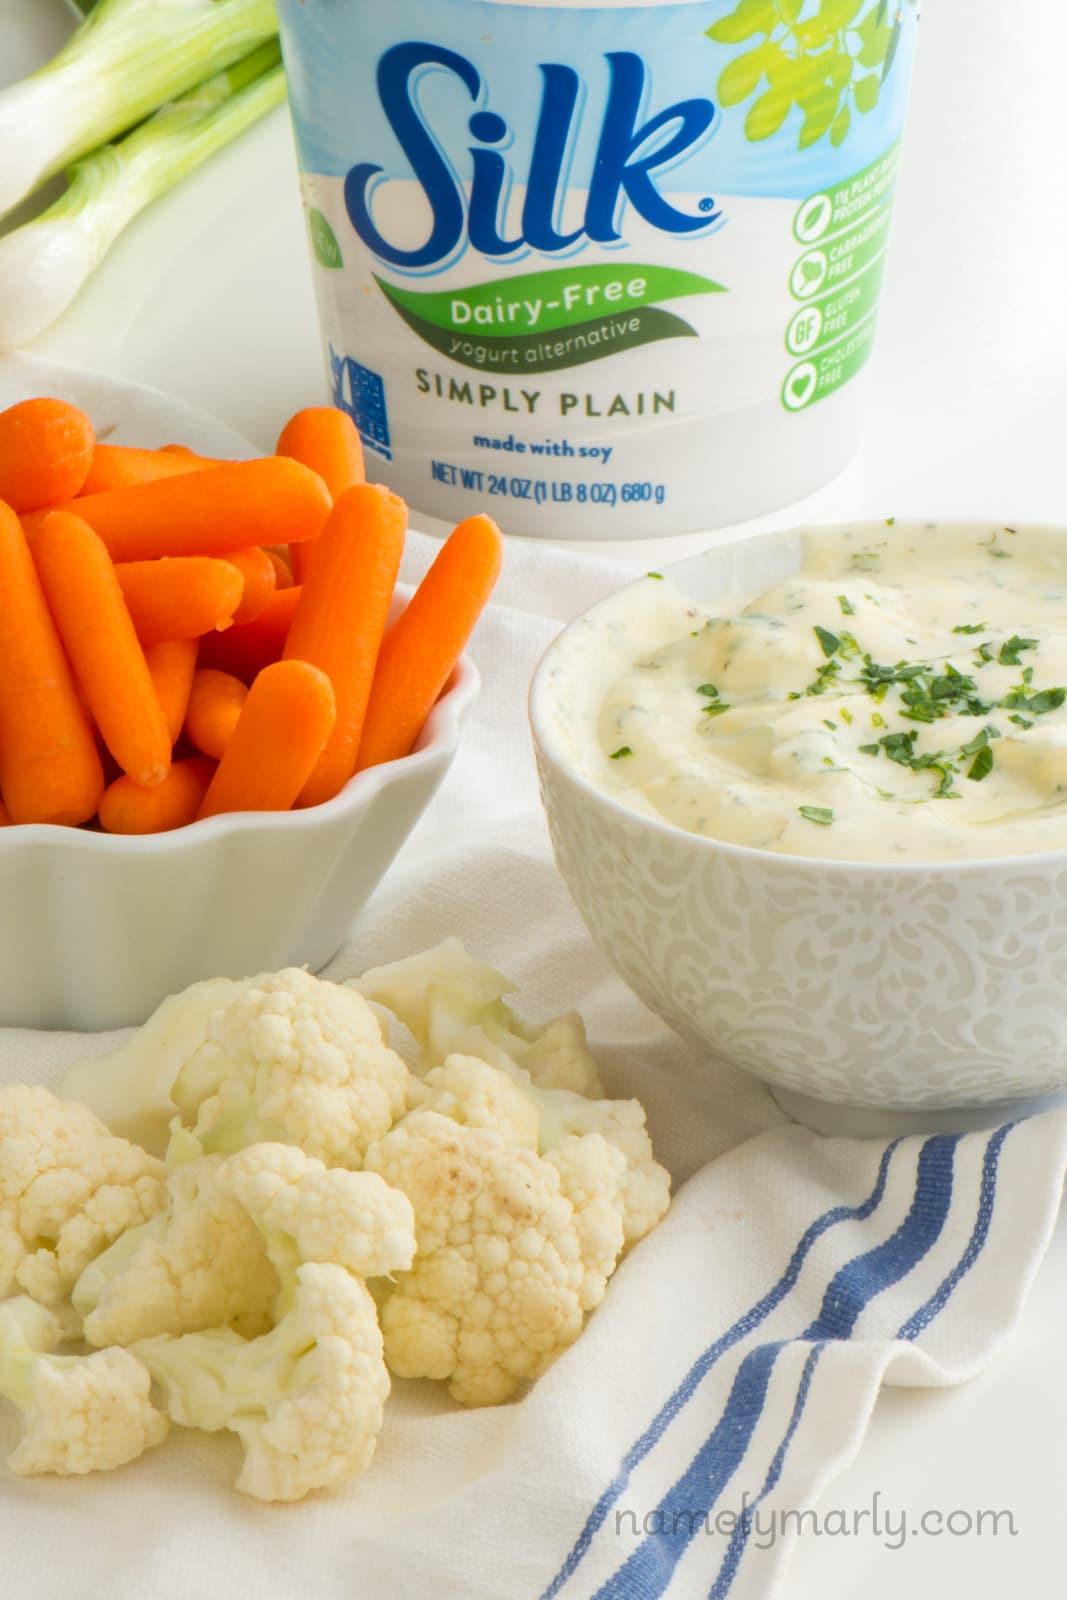 A bowl of ranch dip by cut up veggies and beside vegan yogurt.